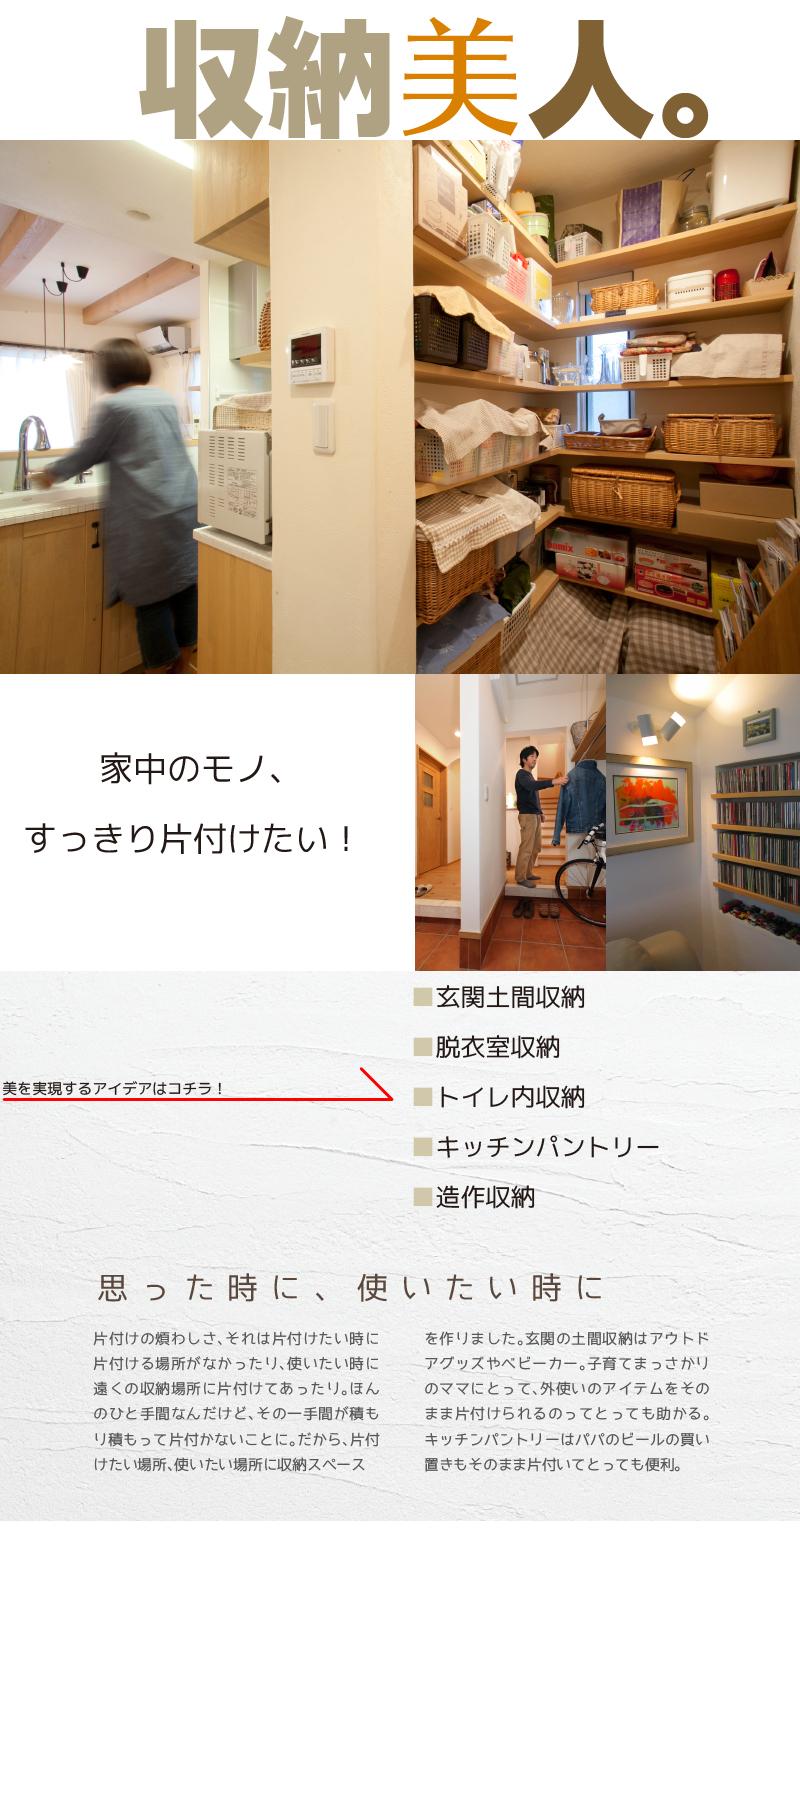 20150620_mamuse03_03